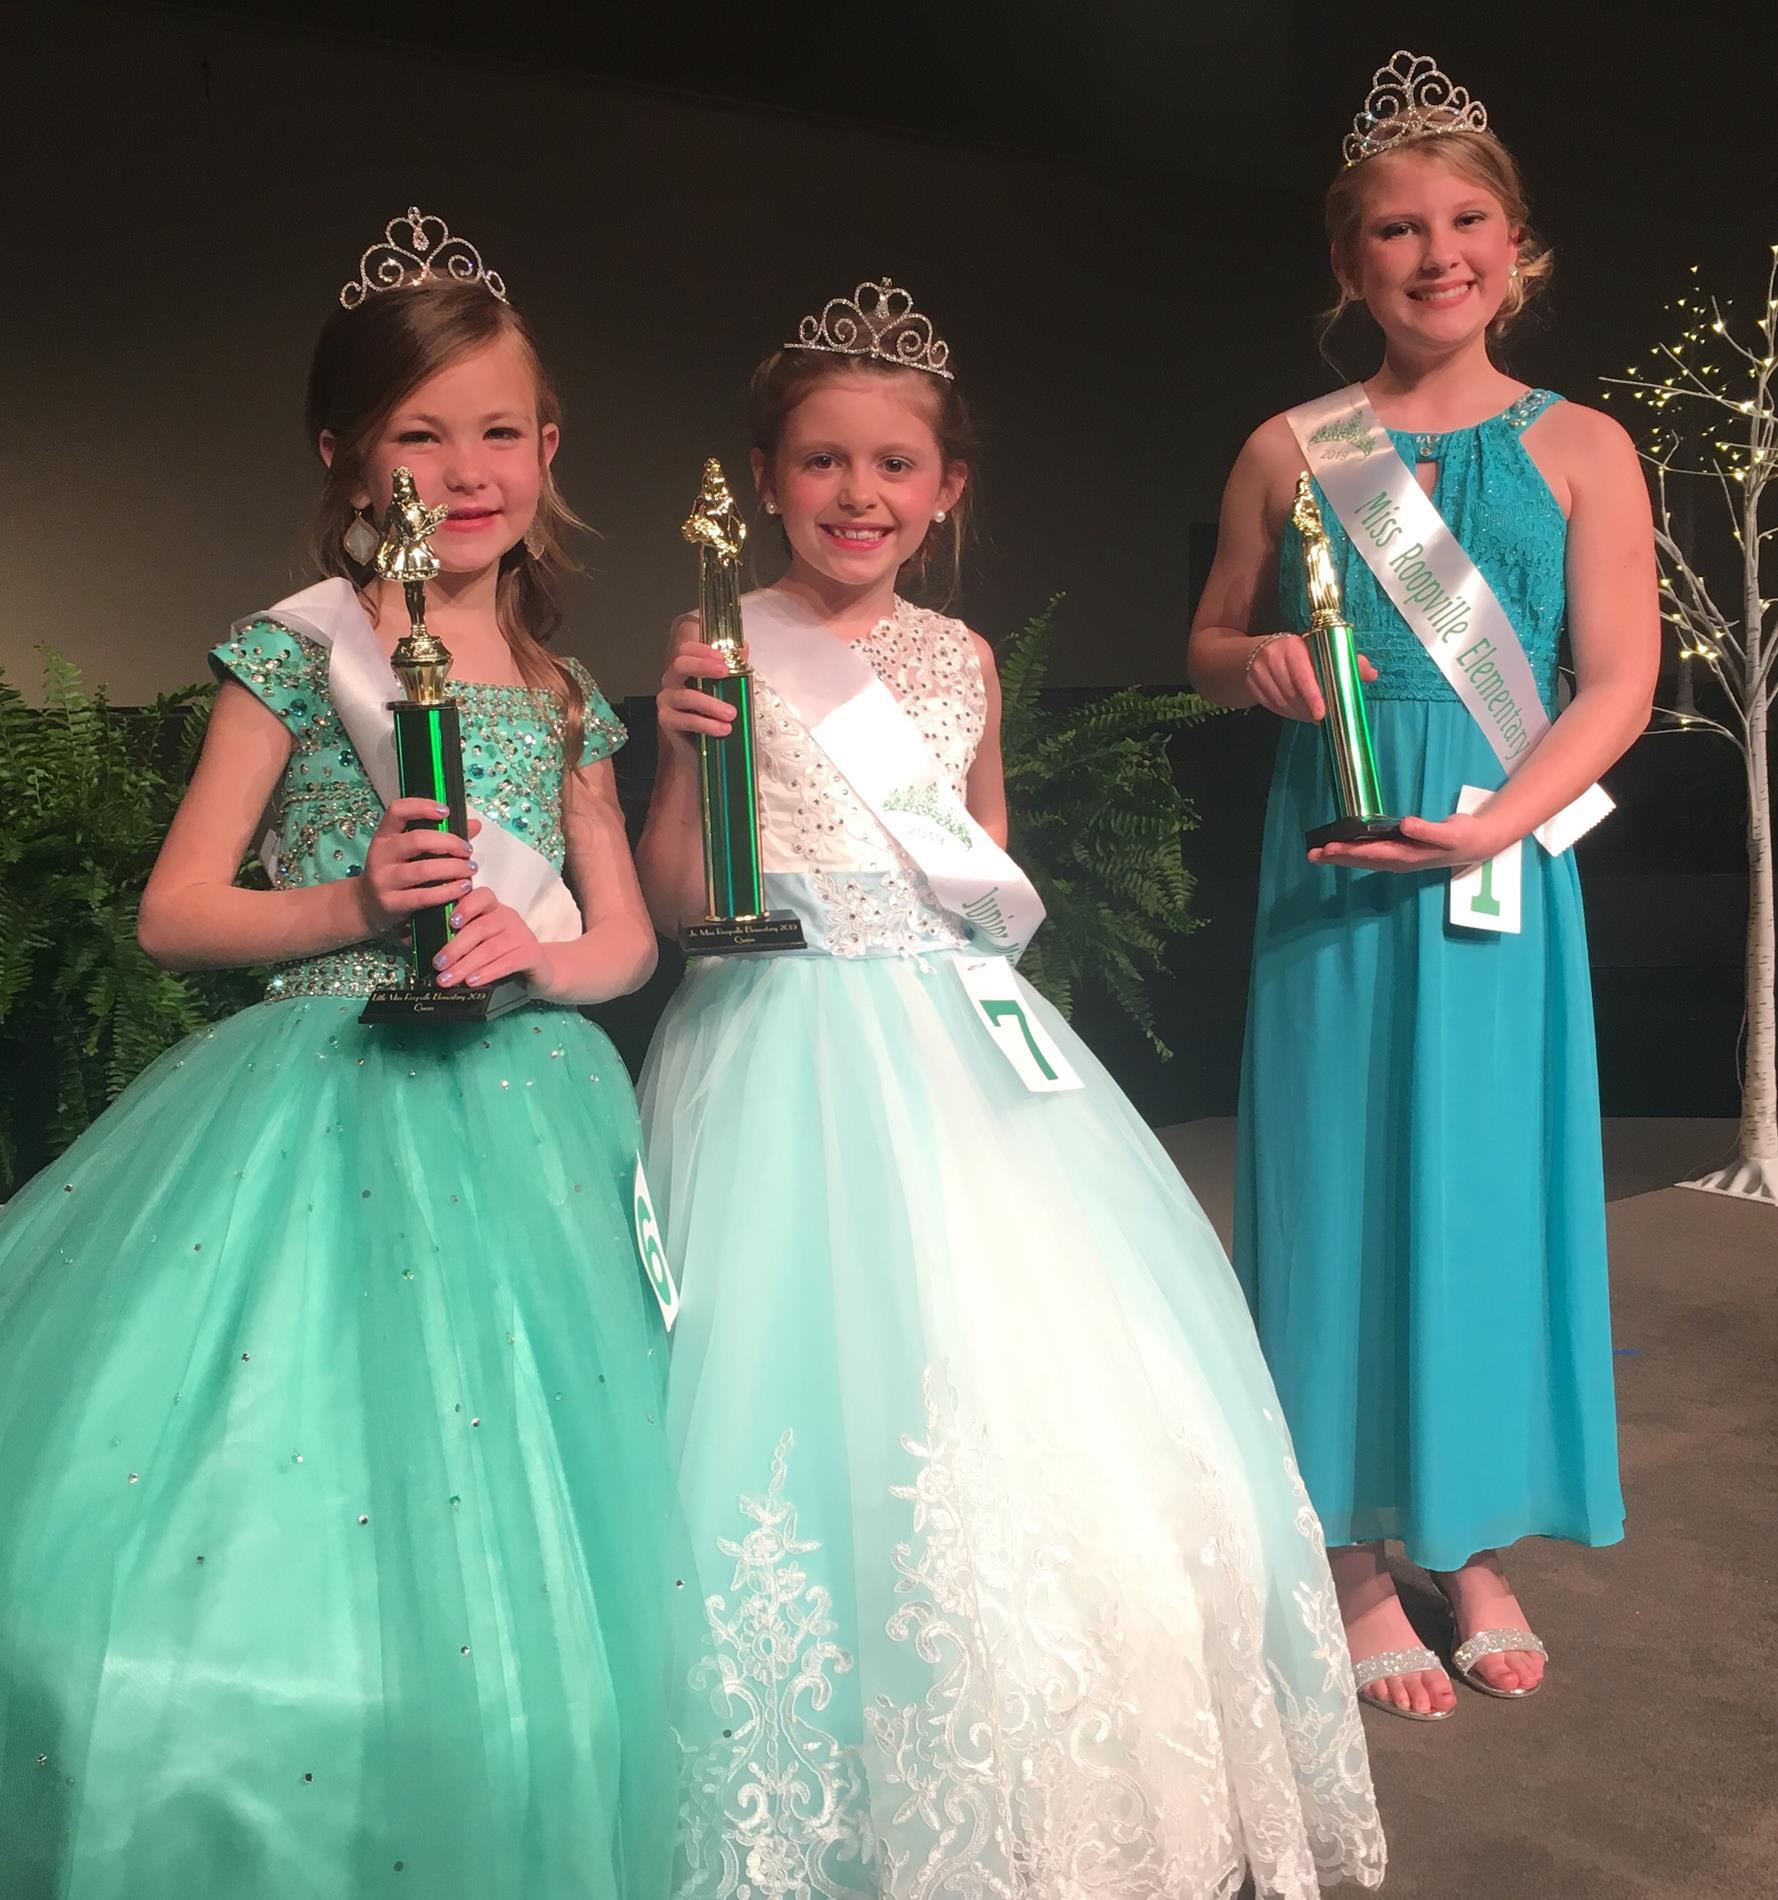 3 Pageant Contestants